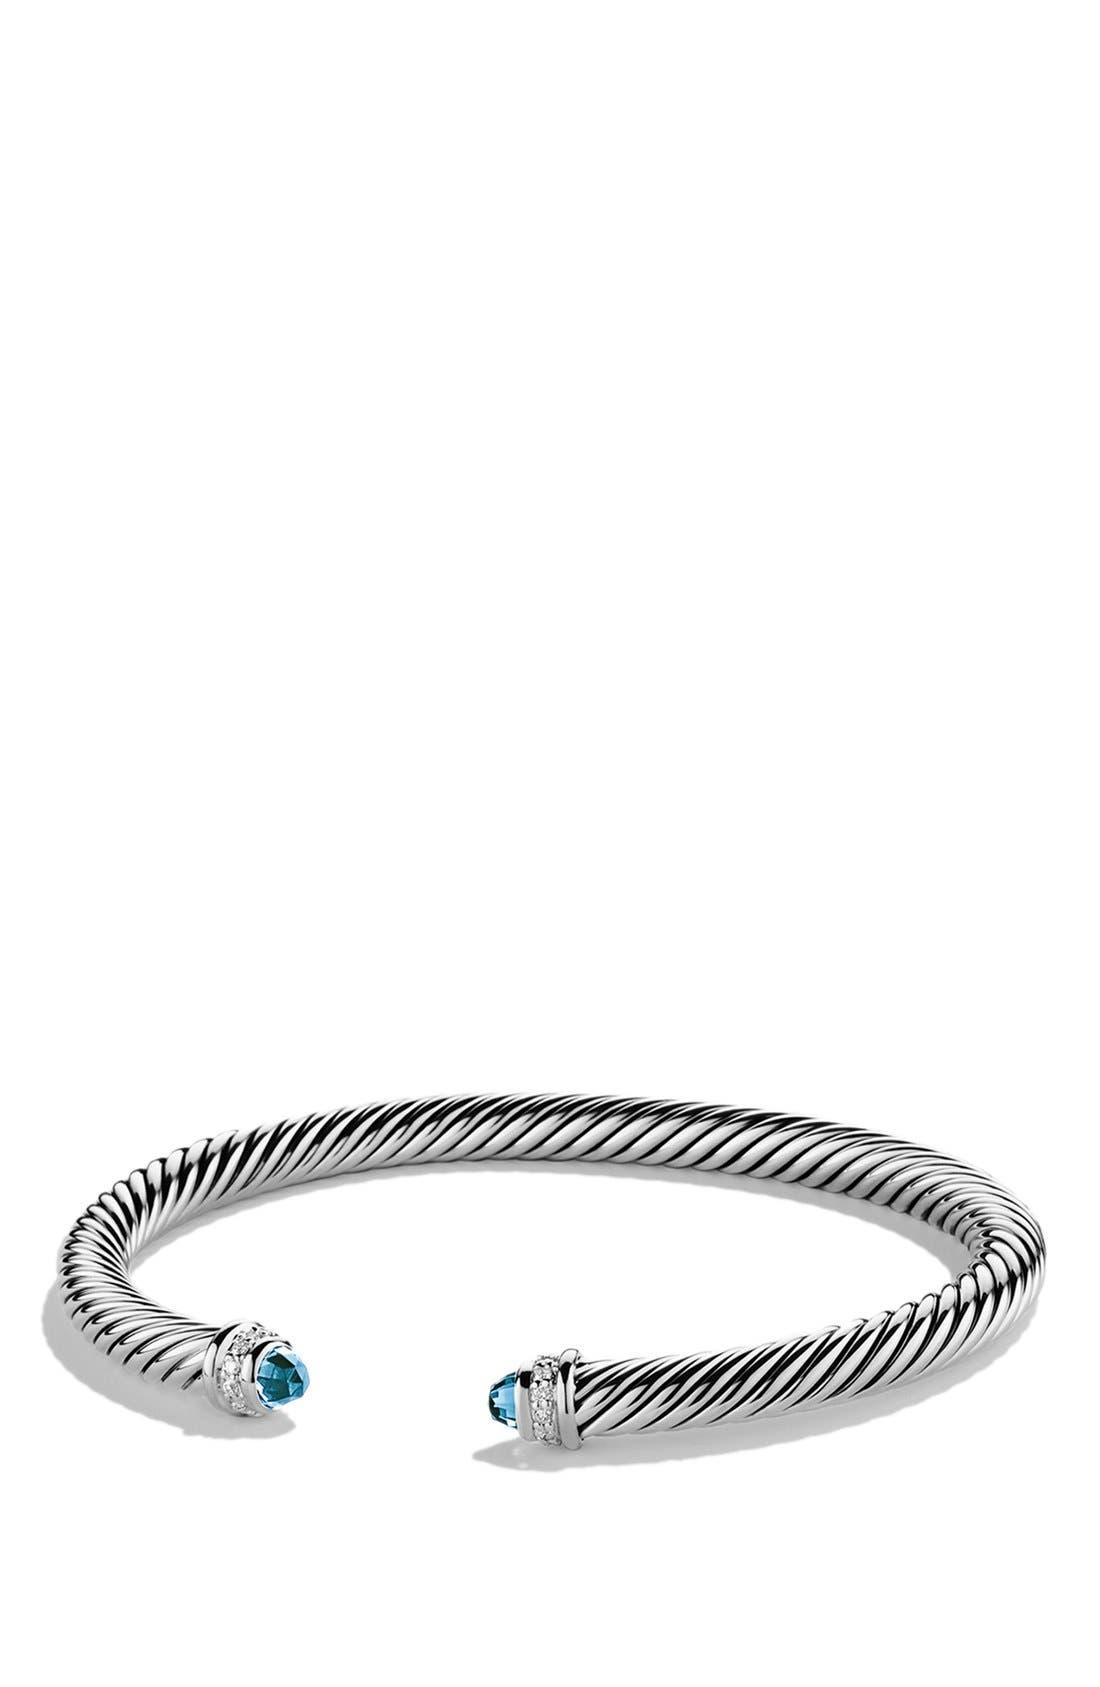 Cable Classics Bracelet with Semiprecious Stones & Diamonds, 5mm,                             Main thumbnail 1, color,                             BLUE TOPAZ